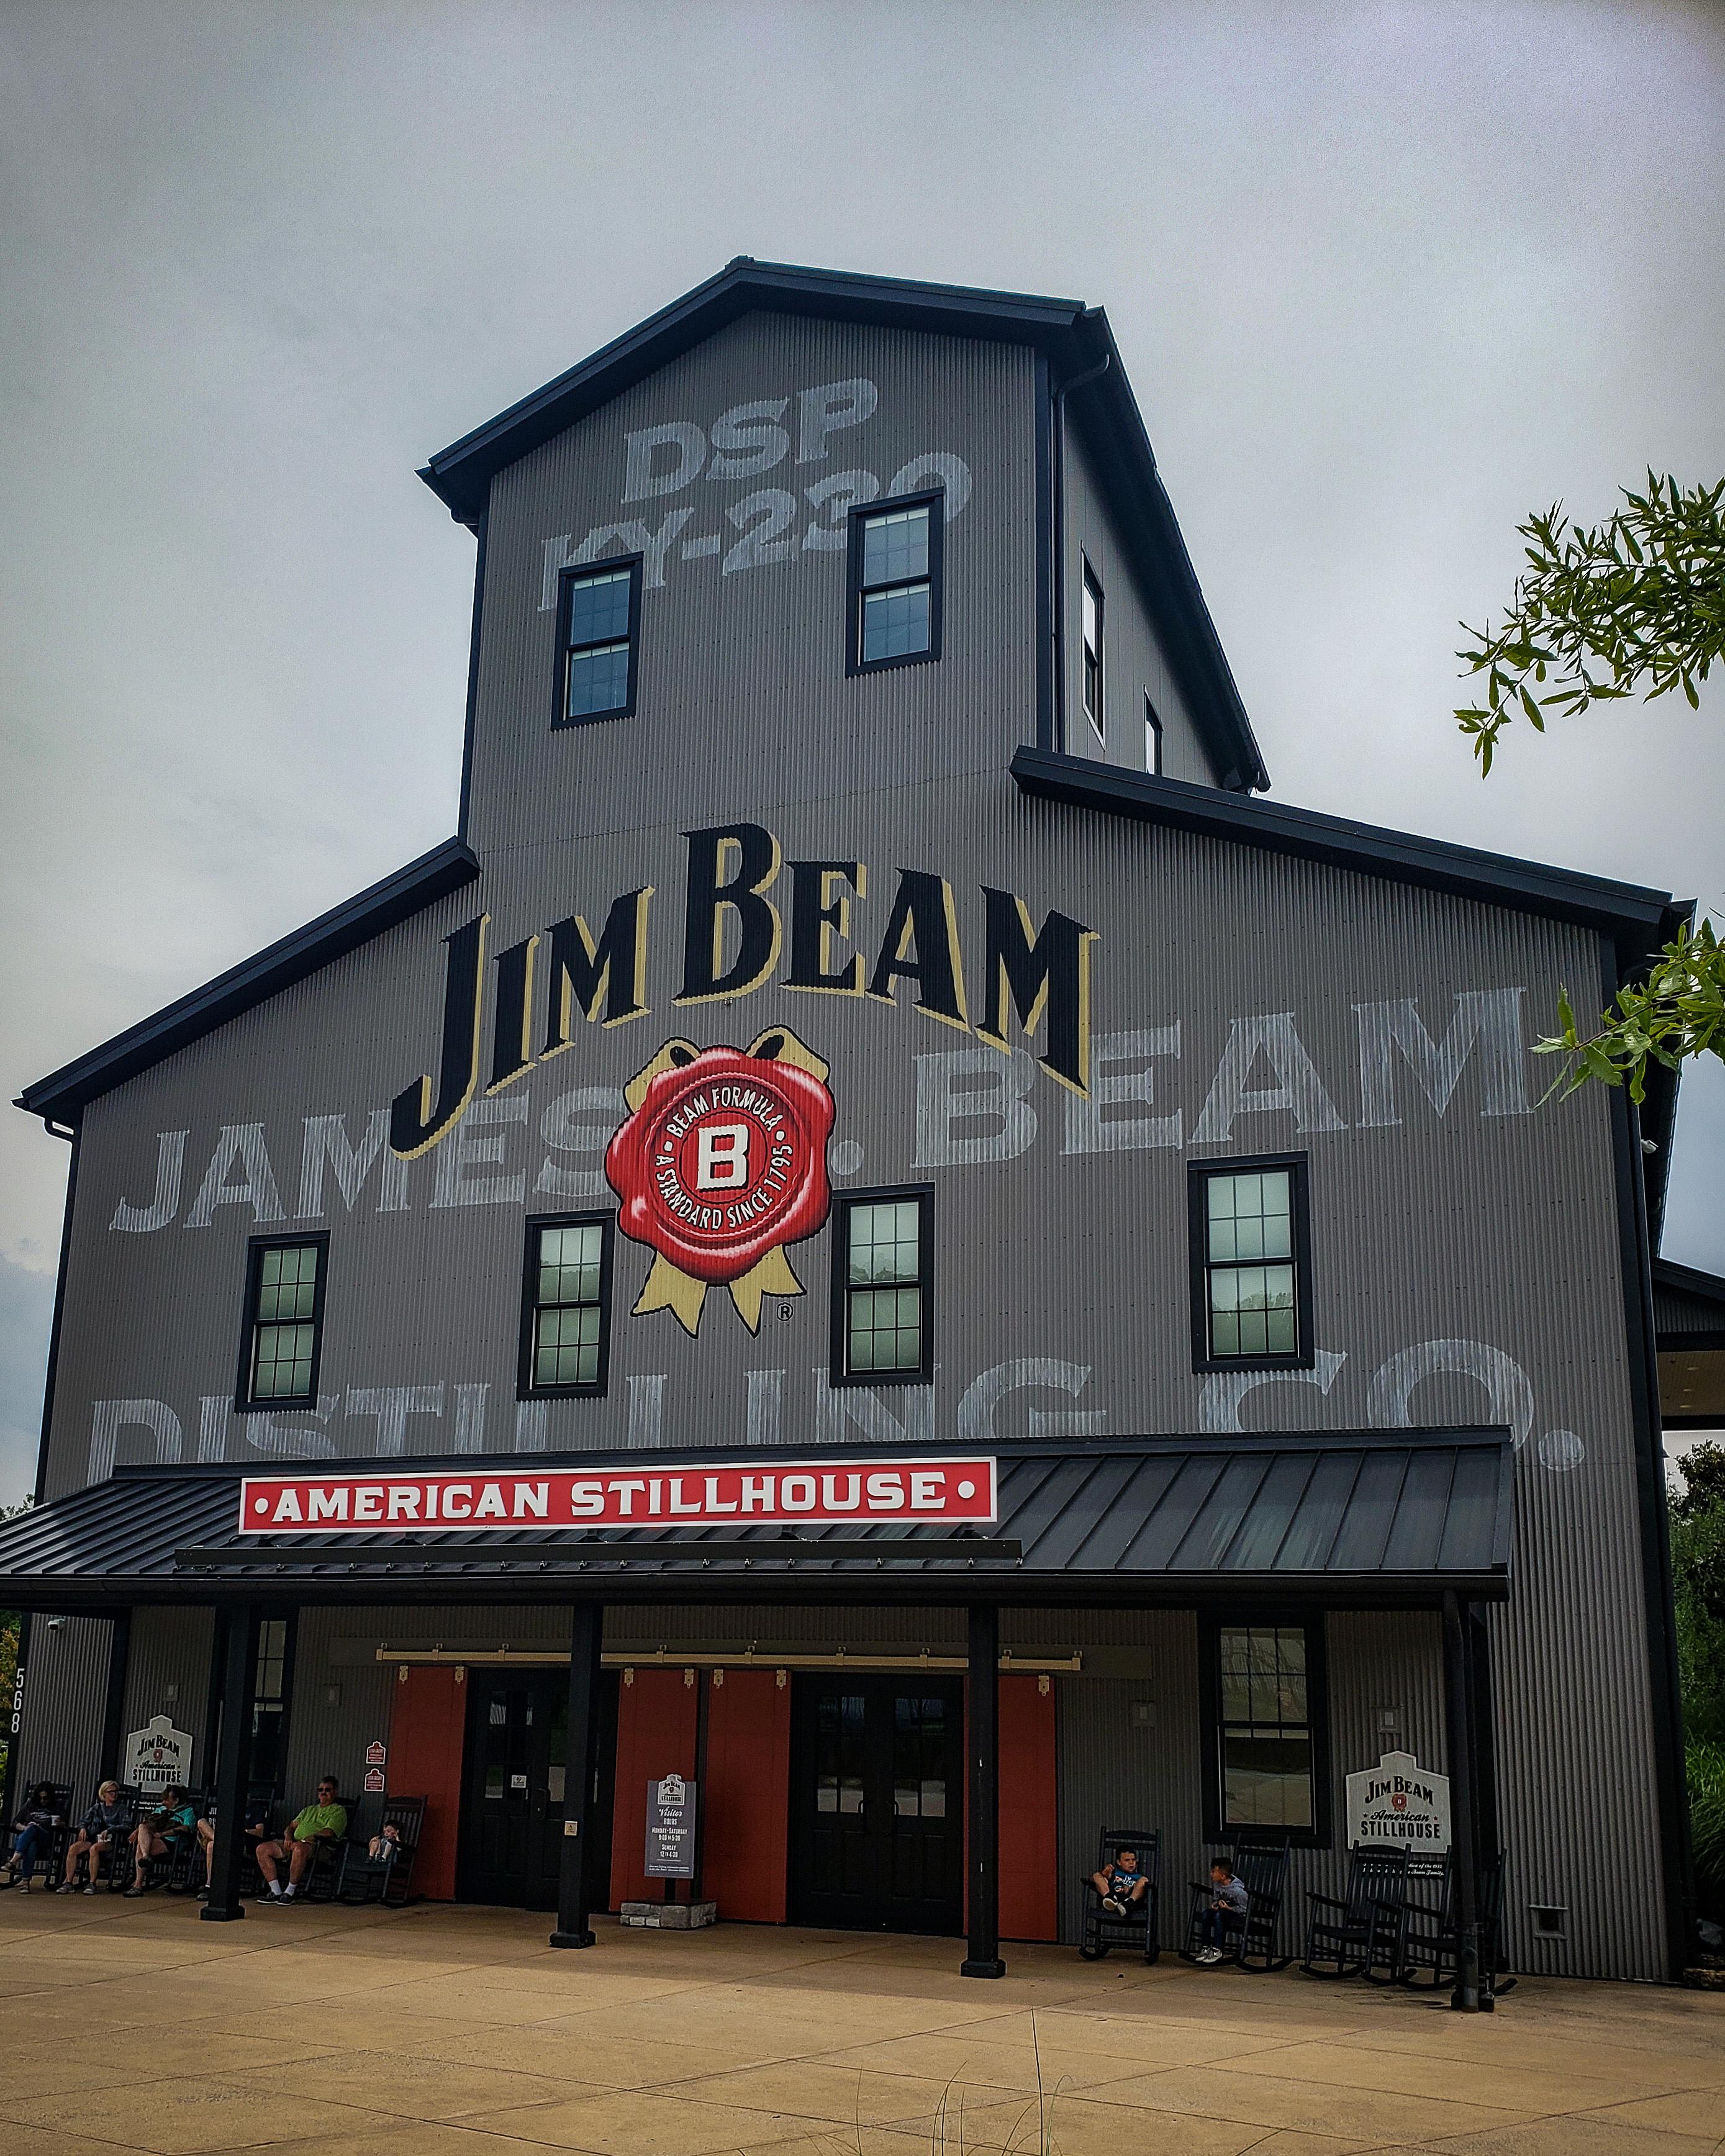 Jim Beam American Stillhouse Tour